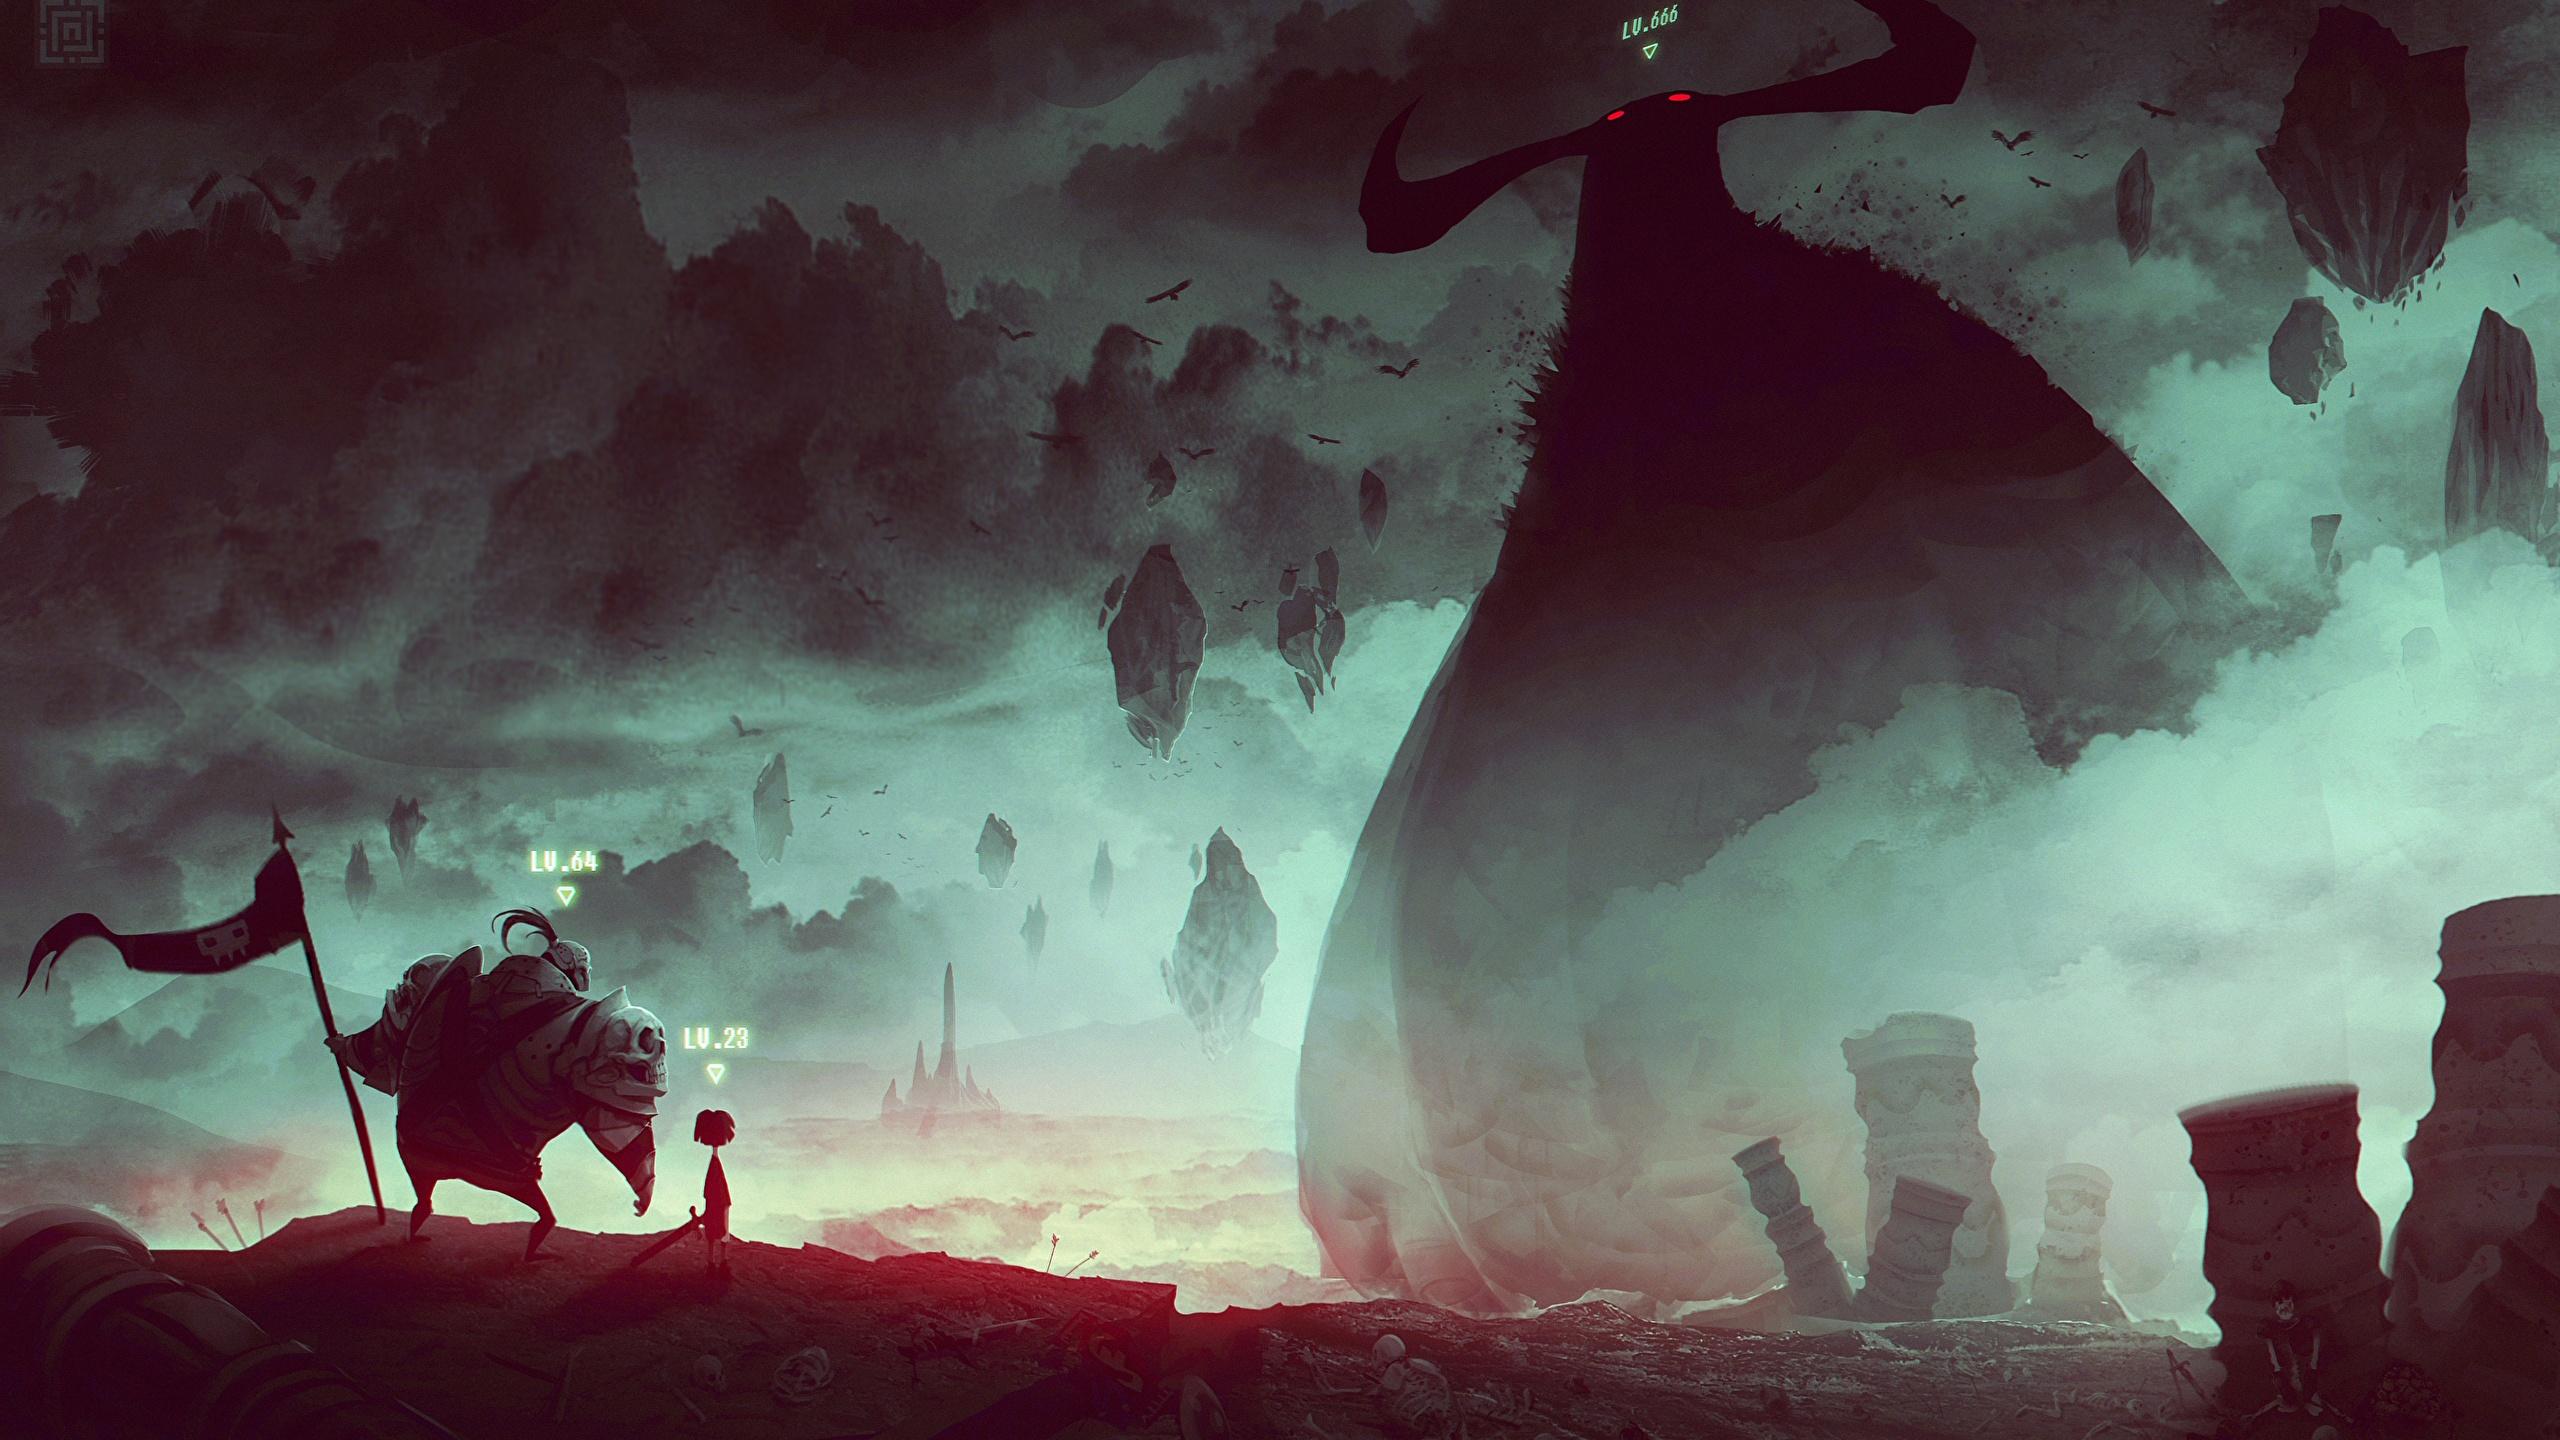 Картинка Монстры воин Фантастика Фантастический мир 2560x1440 монстр чудовище воины Воители Фэнтези